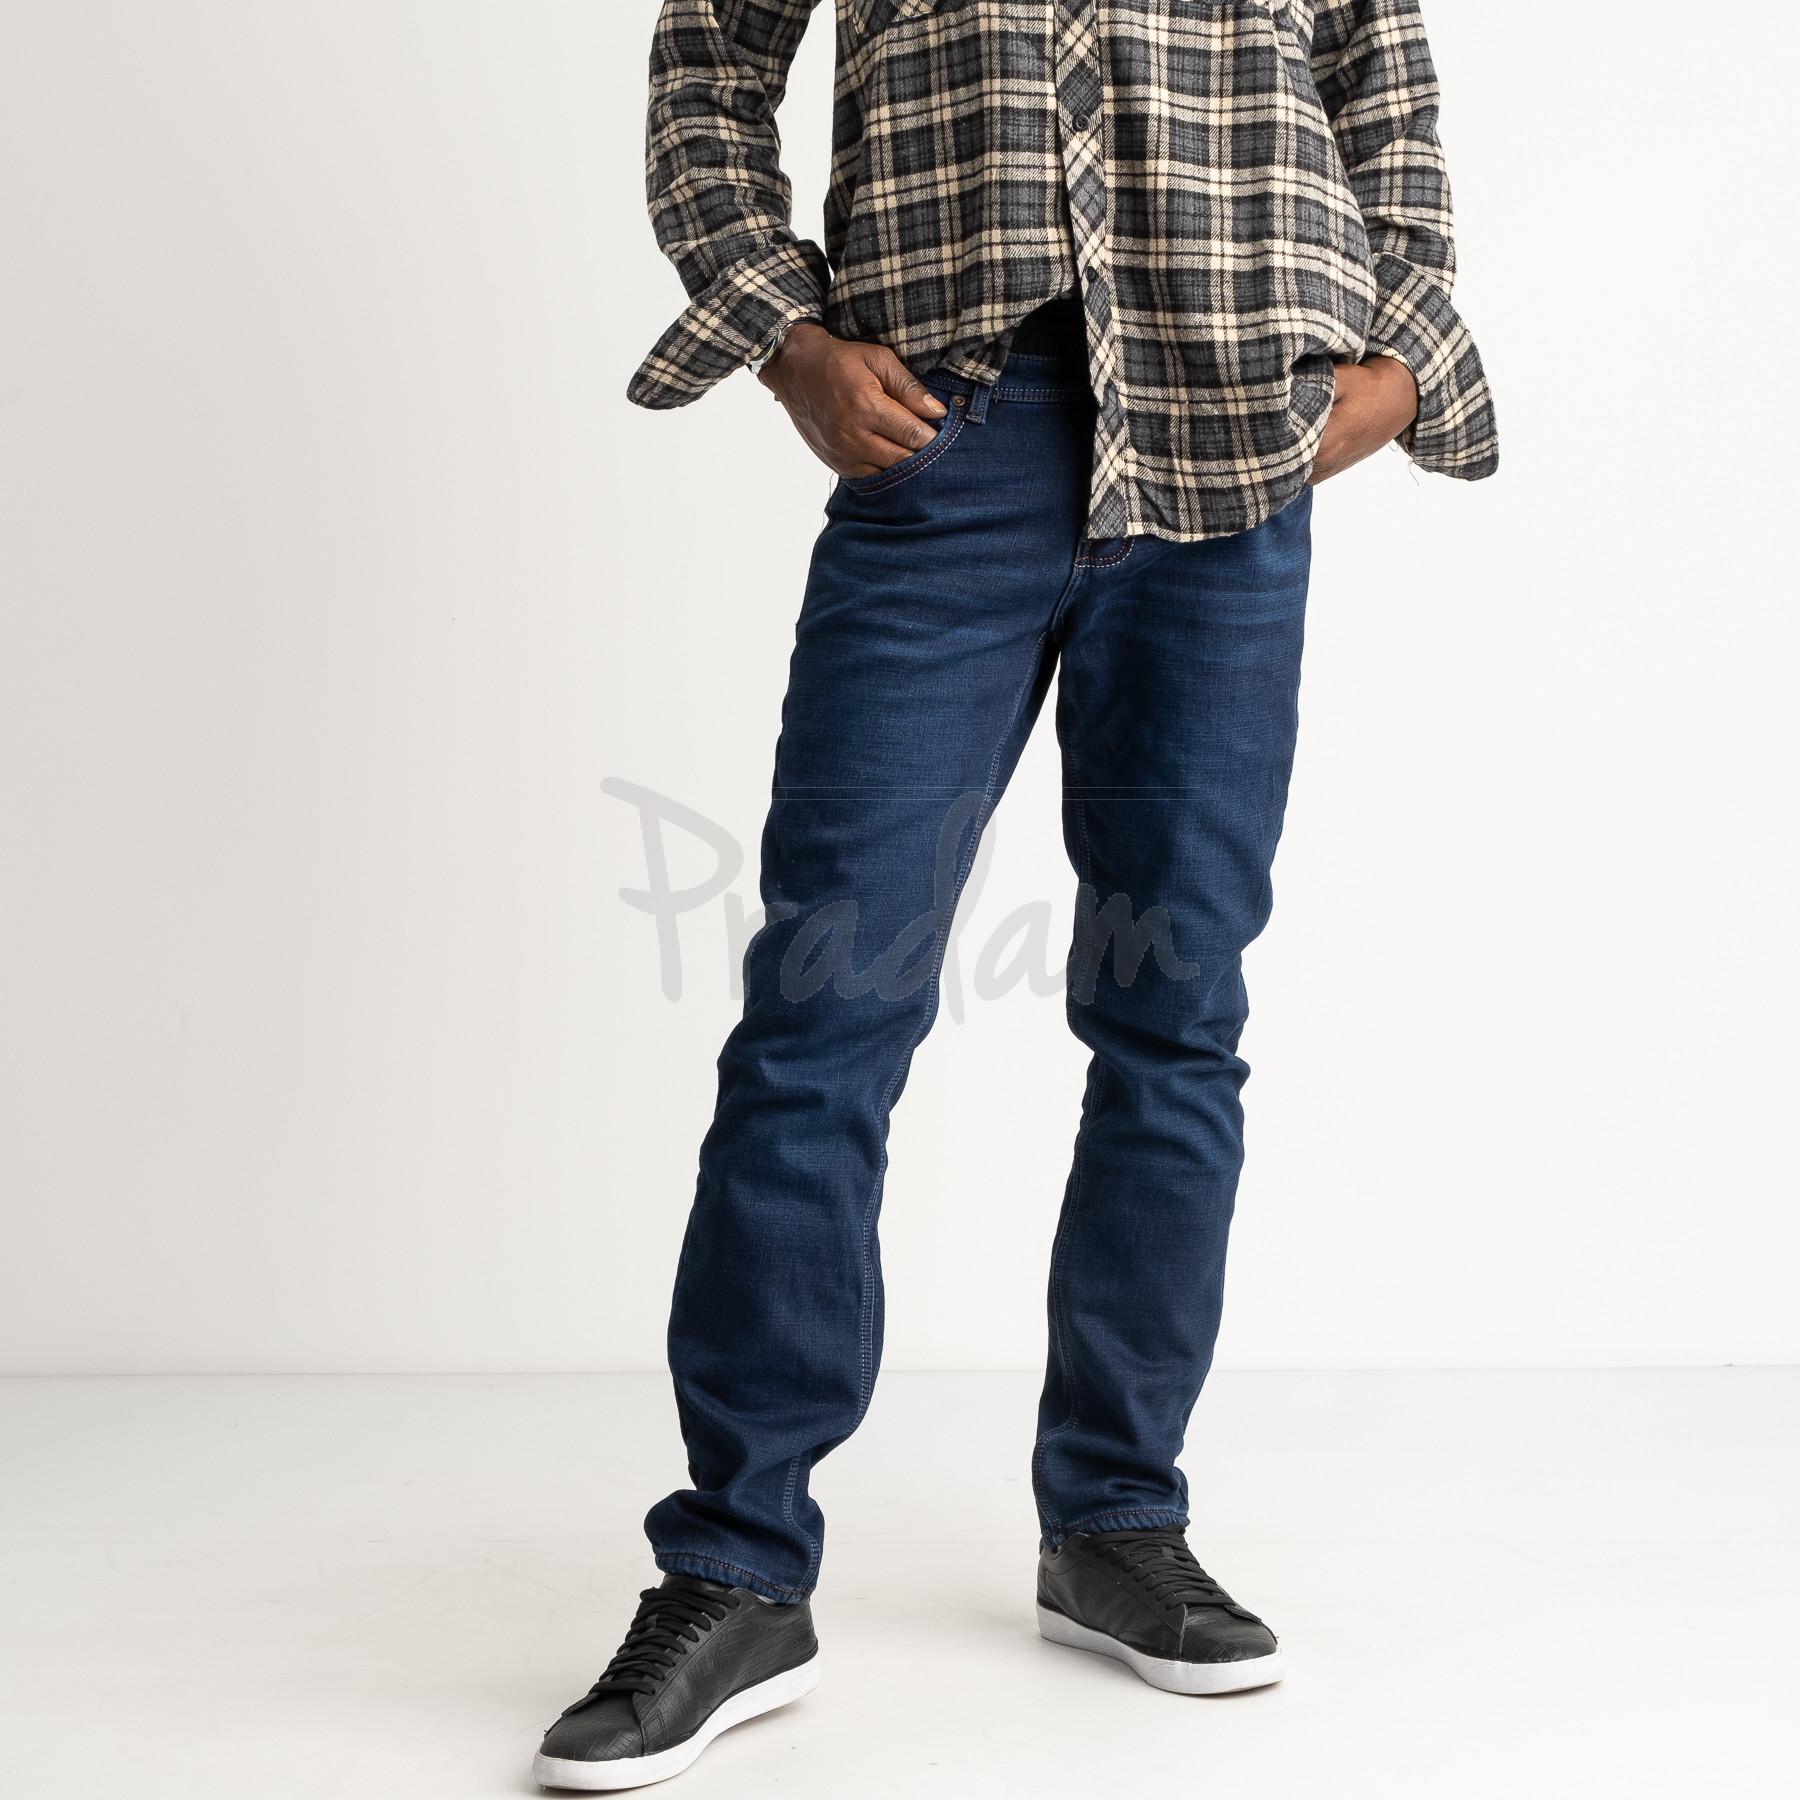 2142 Dsouaviet синие джинсы мужские на флисе стрейчевые  (8 ед. размеры: 29.30.31.32.33.34.36.38)